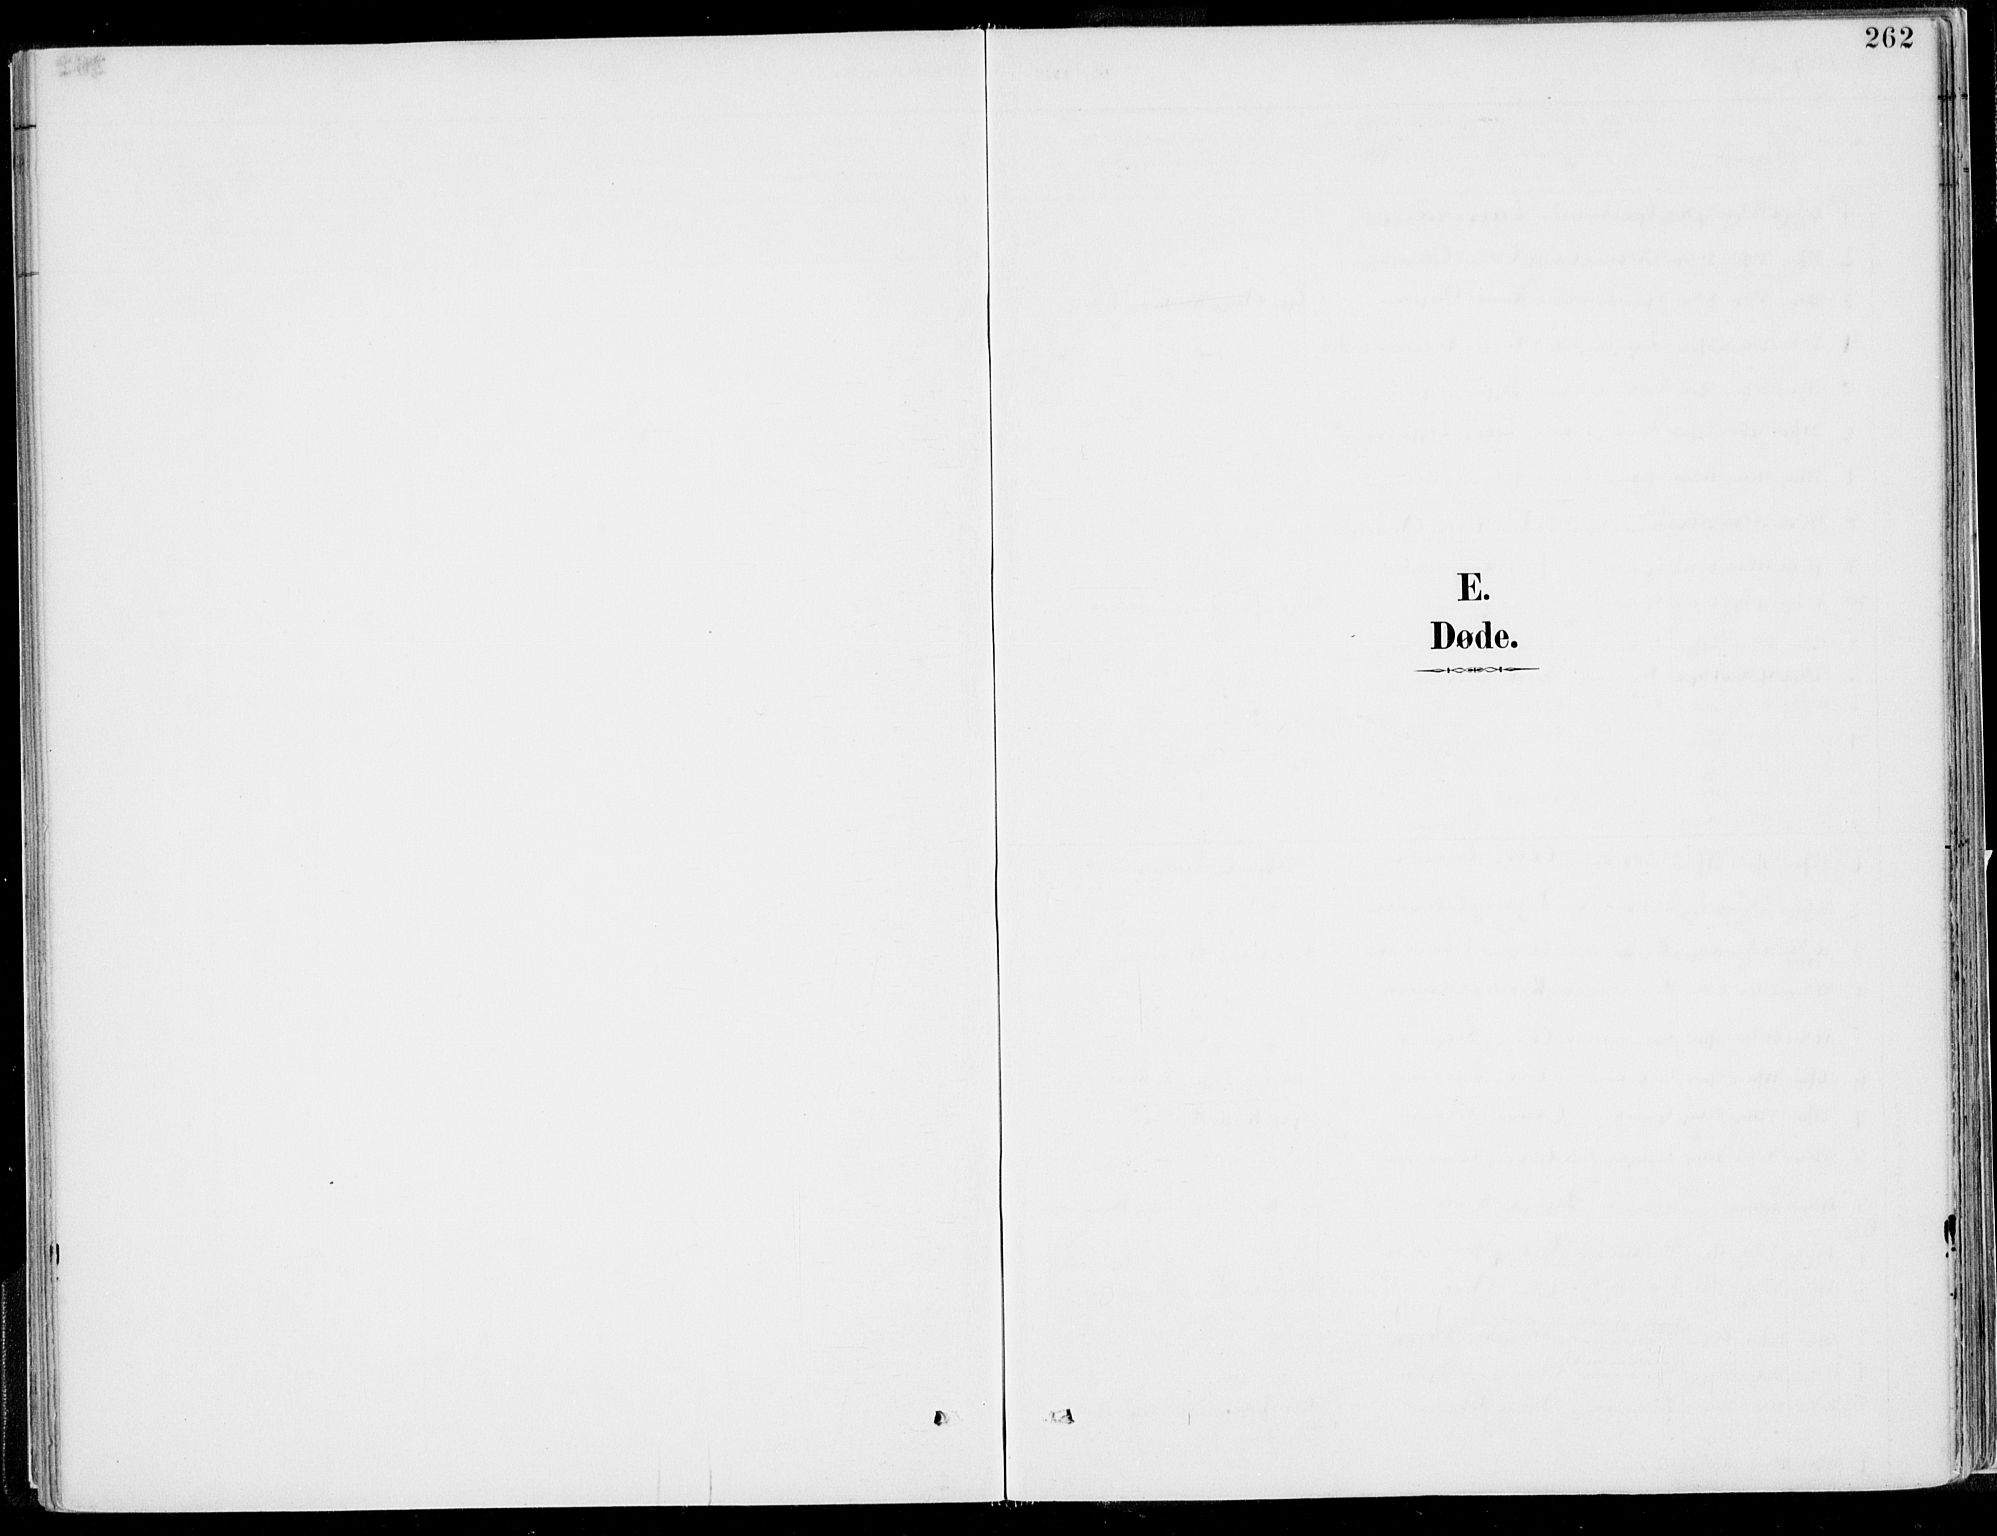 SAB, Kvinnherad Sokneprestembete, H/Haa: Ministerialbok nr. B  1, 1887-1921, s. 262